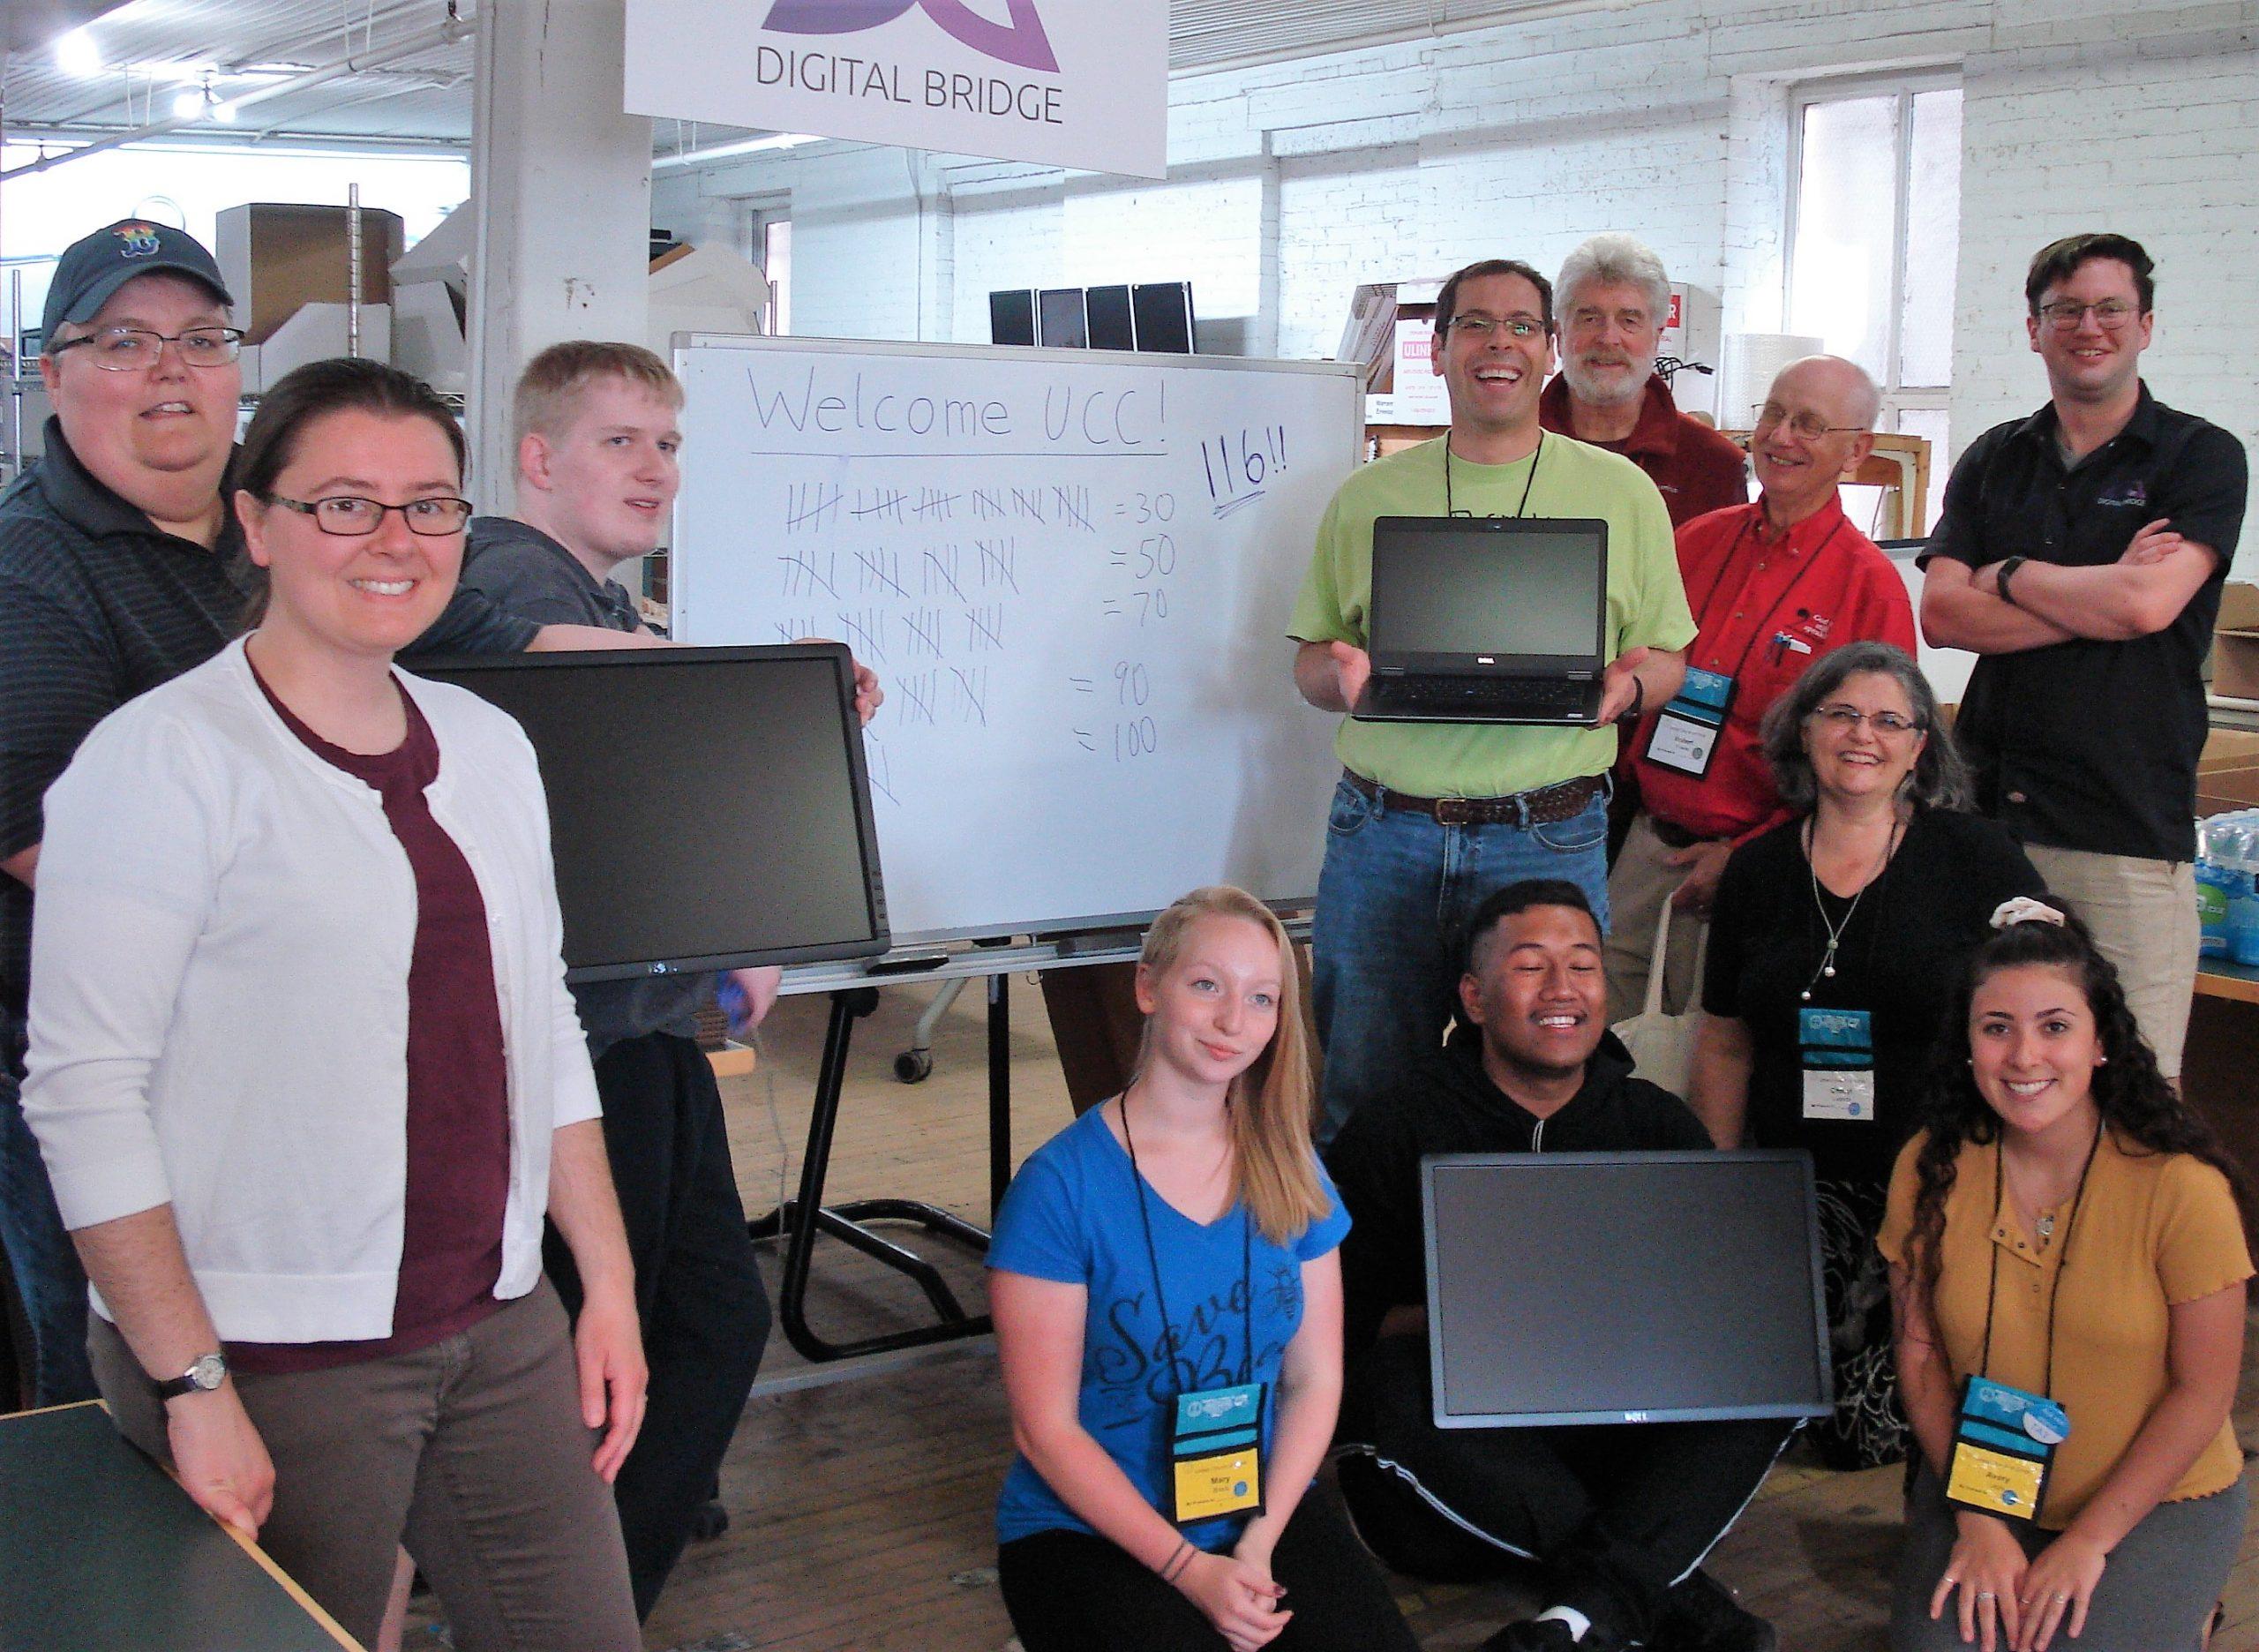 Digital Bridge service project celebration 6/22/19